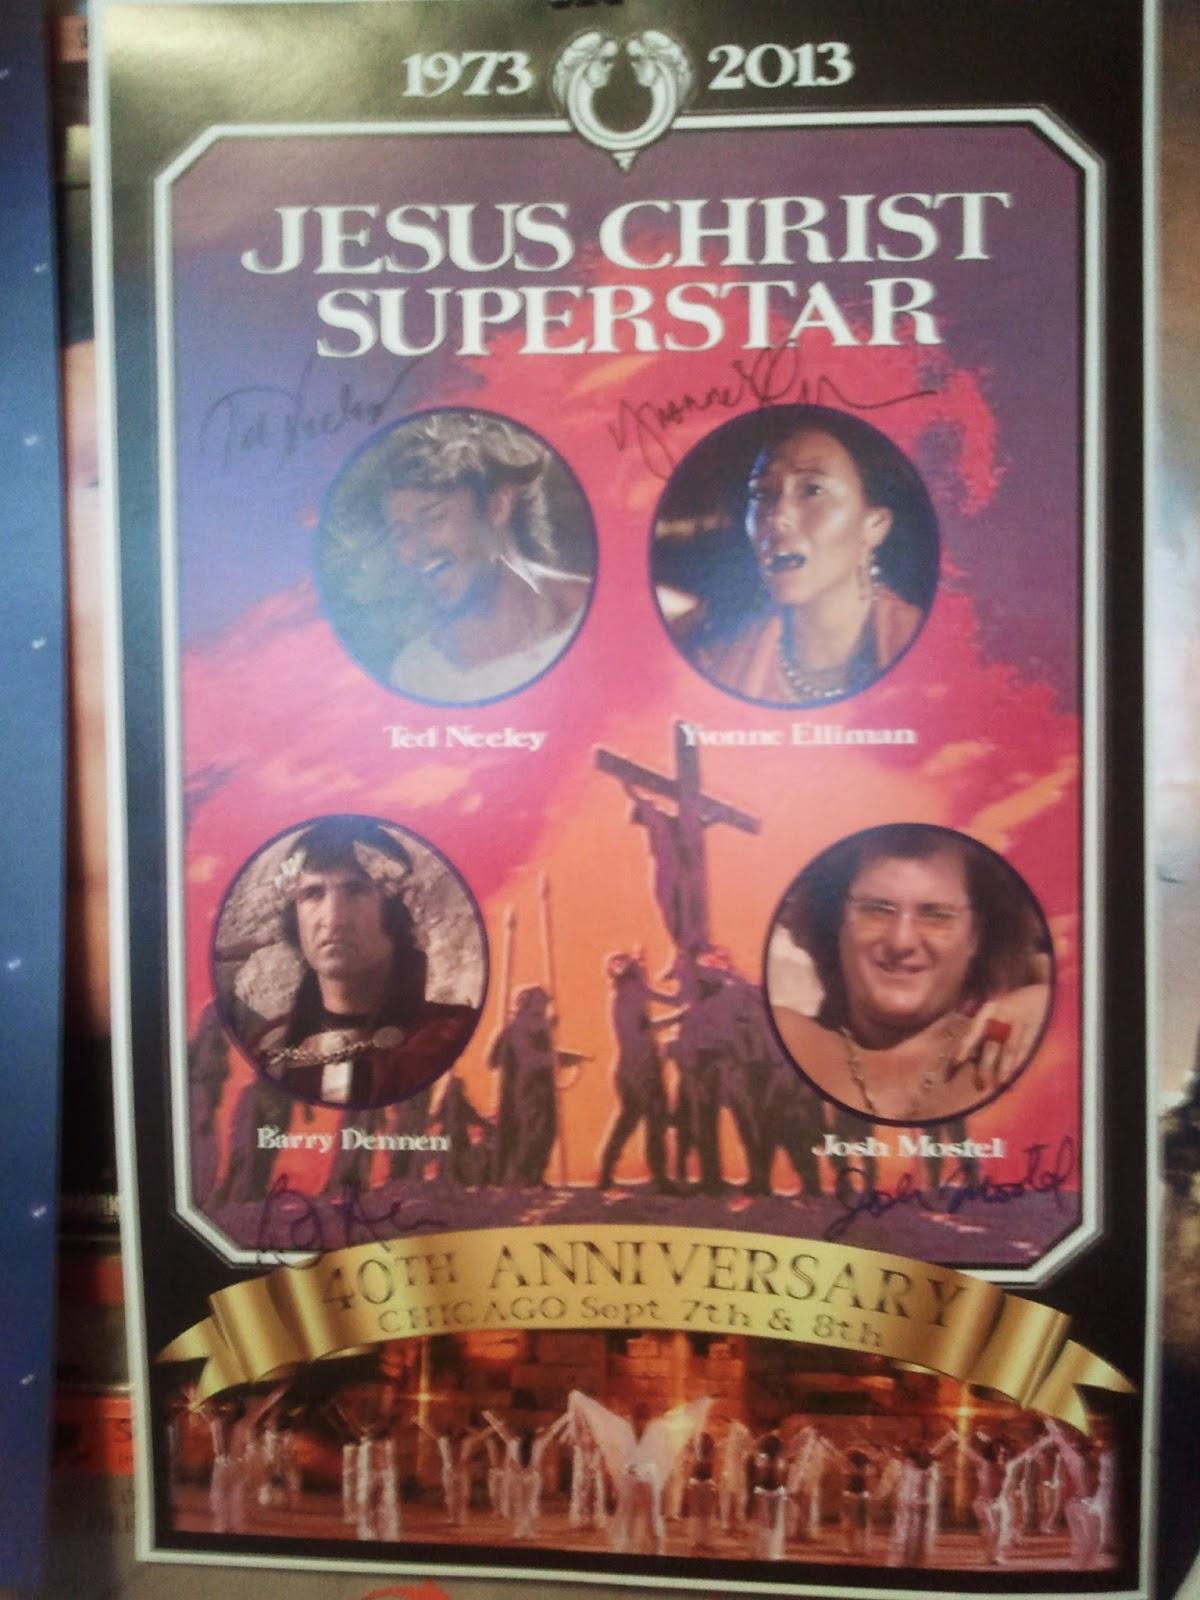 Jesus Christ Superstar Celebration at the Arclight Hollywood